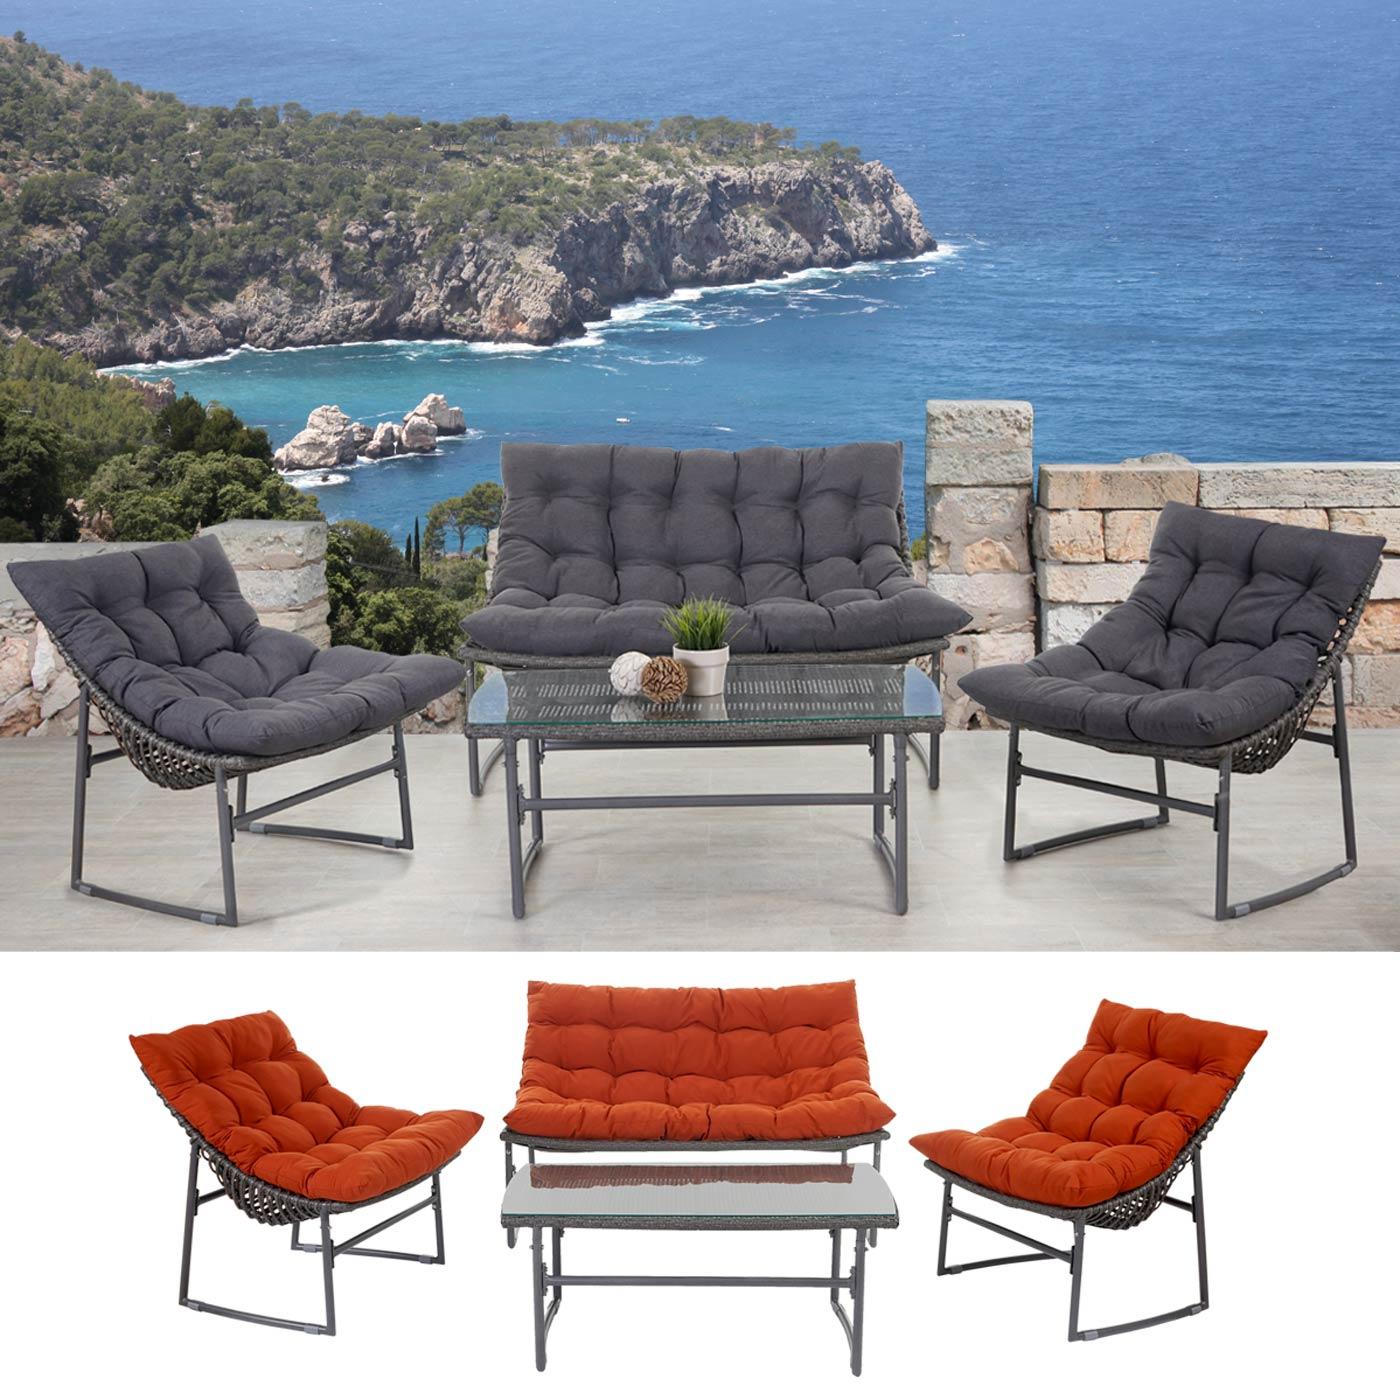 2 1 1 poly rattan garten garnitur tunis sitzgruppe lounge set aluminium ebay. Black Bedroom Furniture Sets. Home Design Ideas